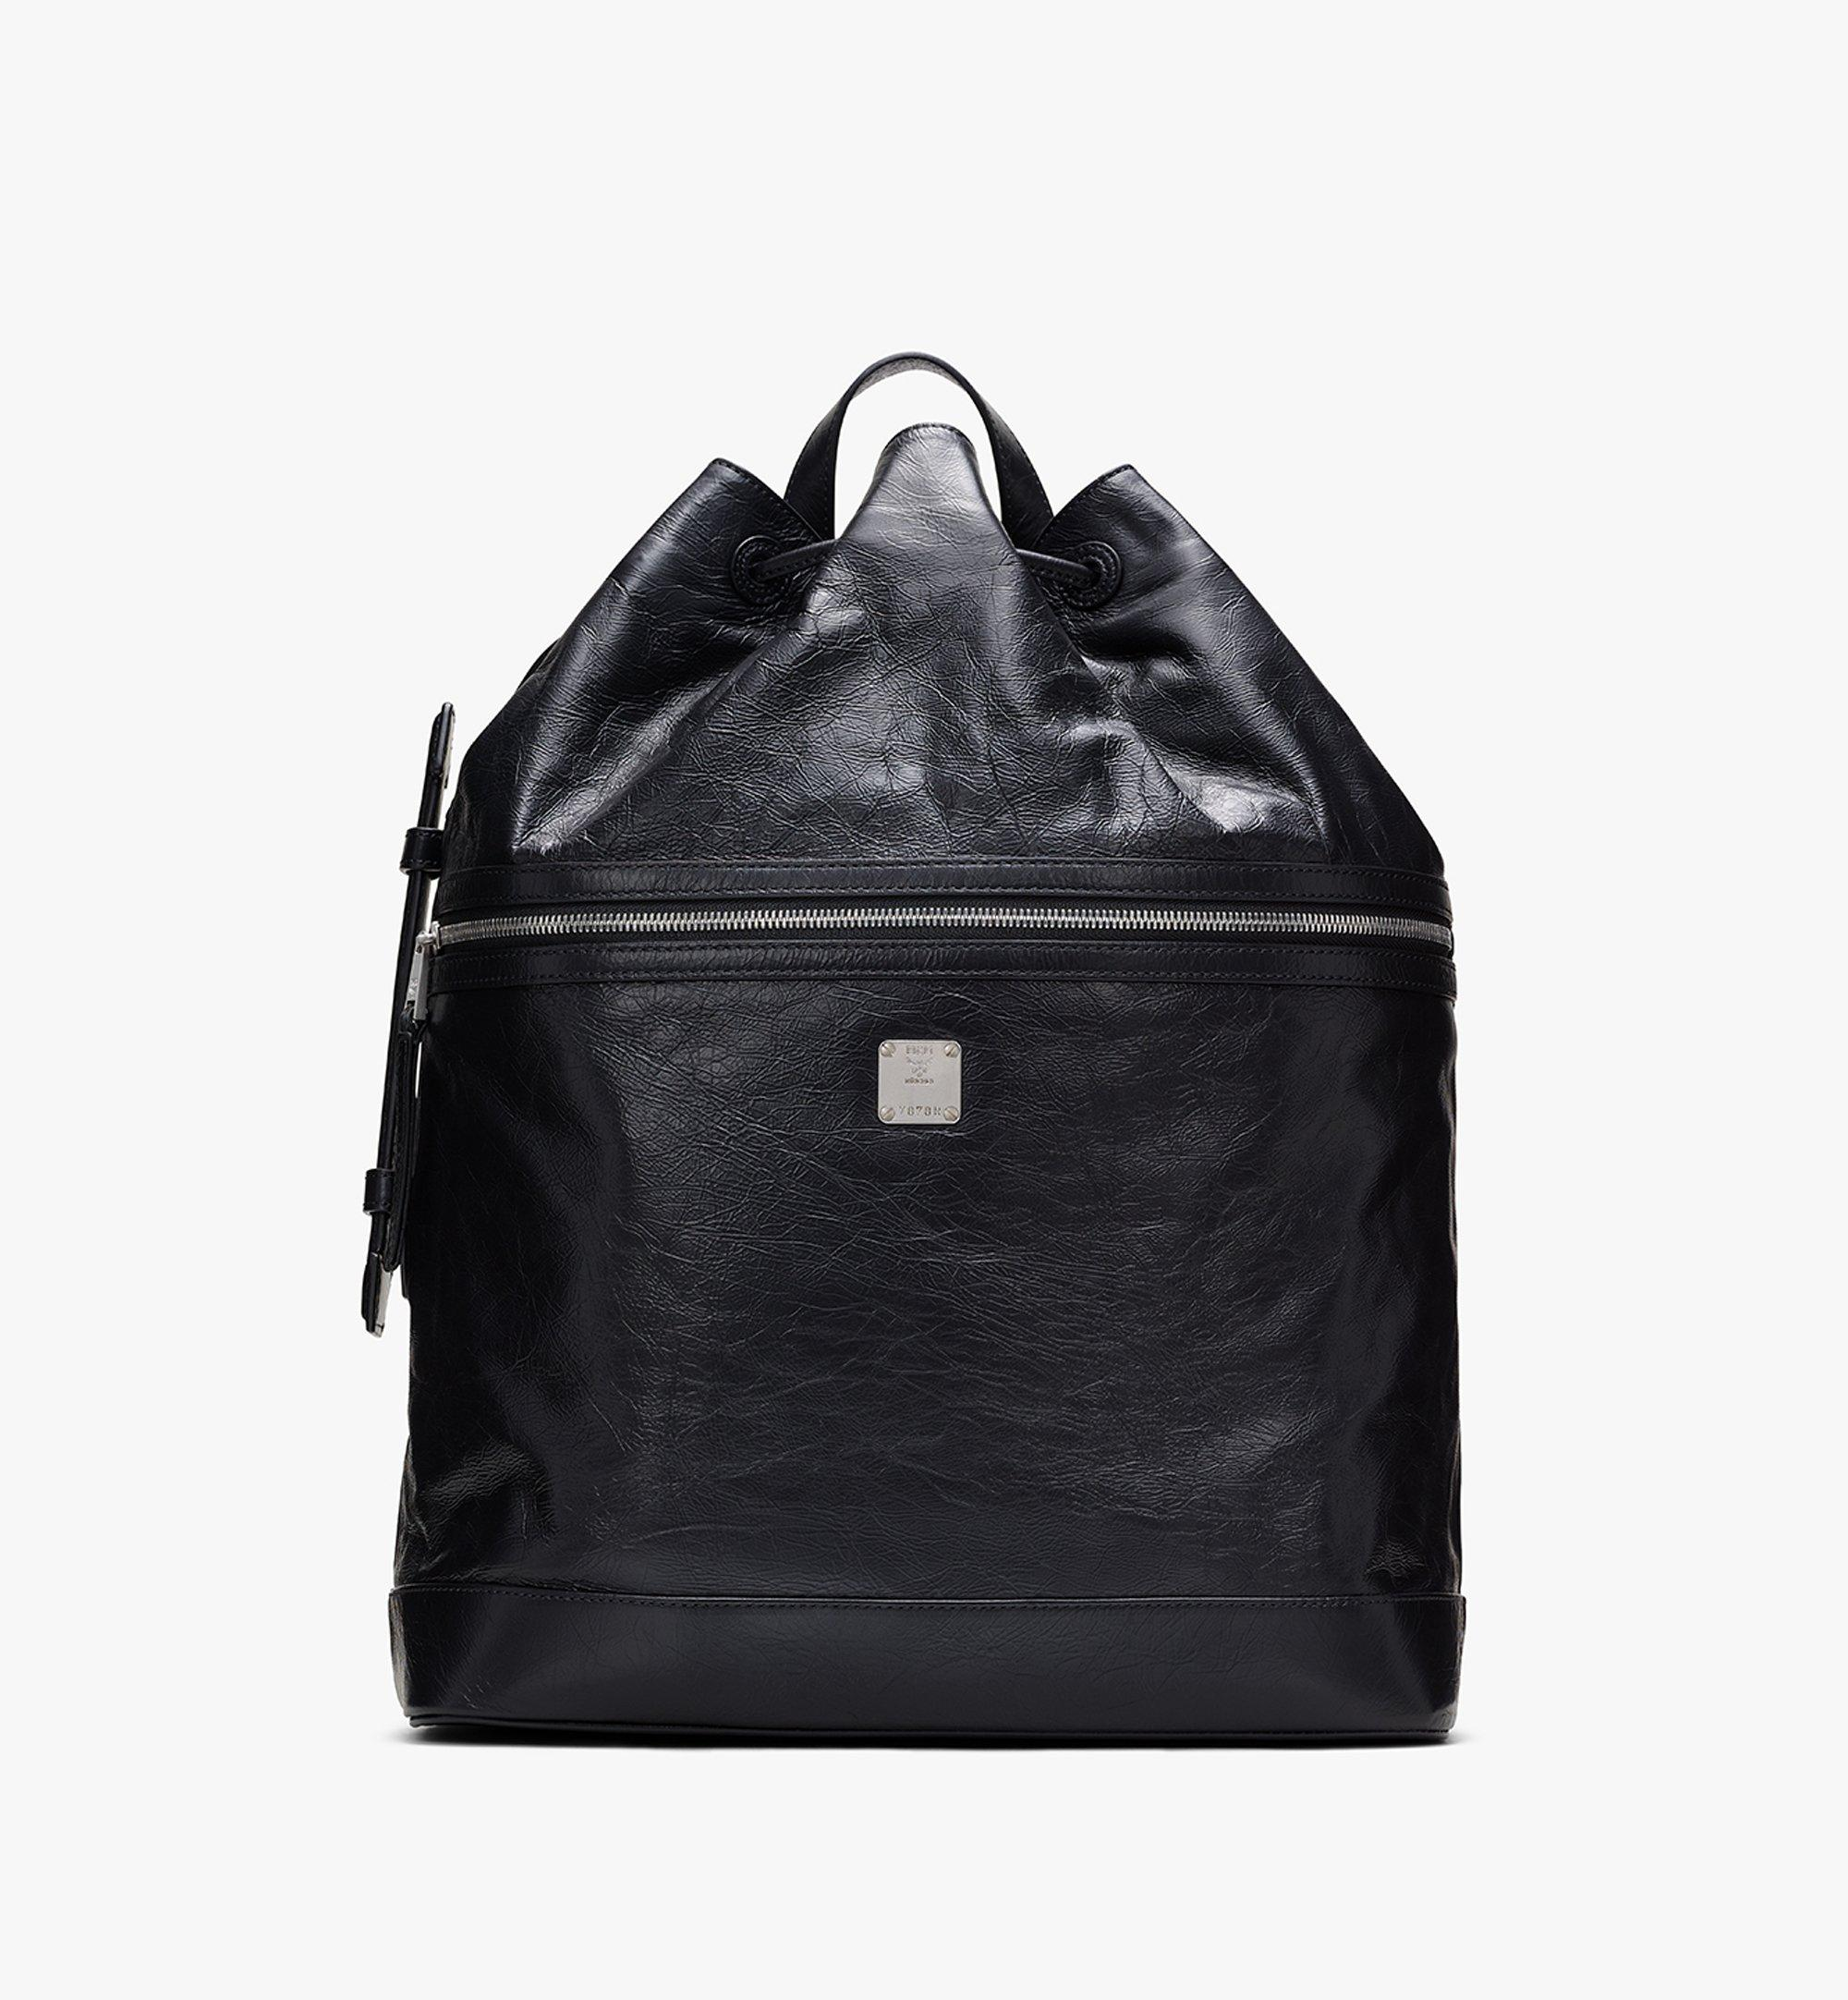 MCM Klassik Drawstring Backpack in Crushed Leather Black MMDASKC01BK001 Alternate View 1